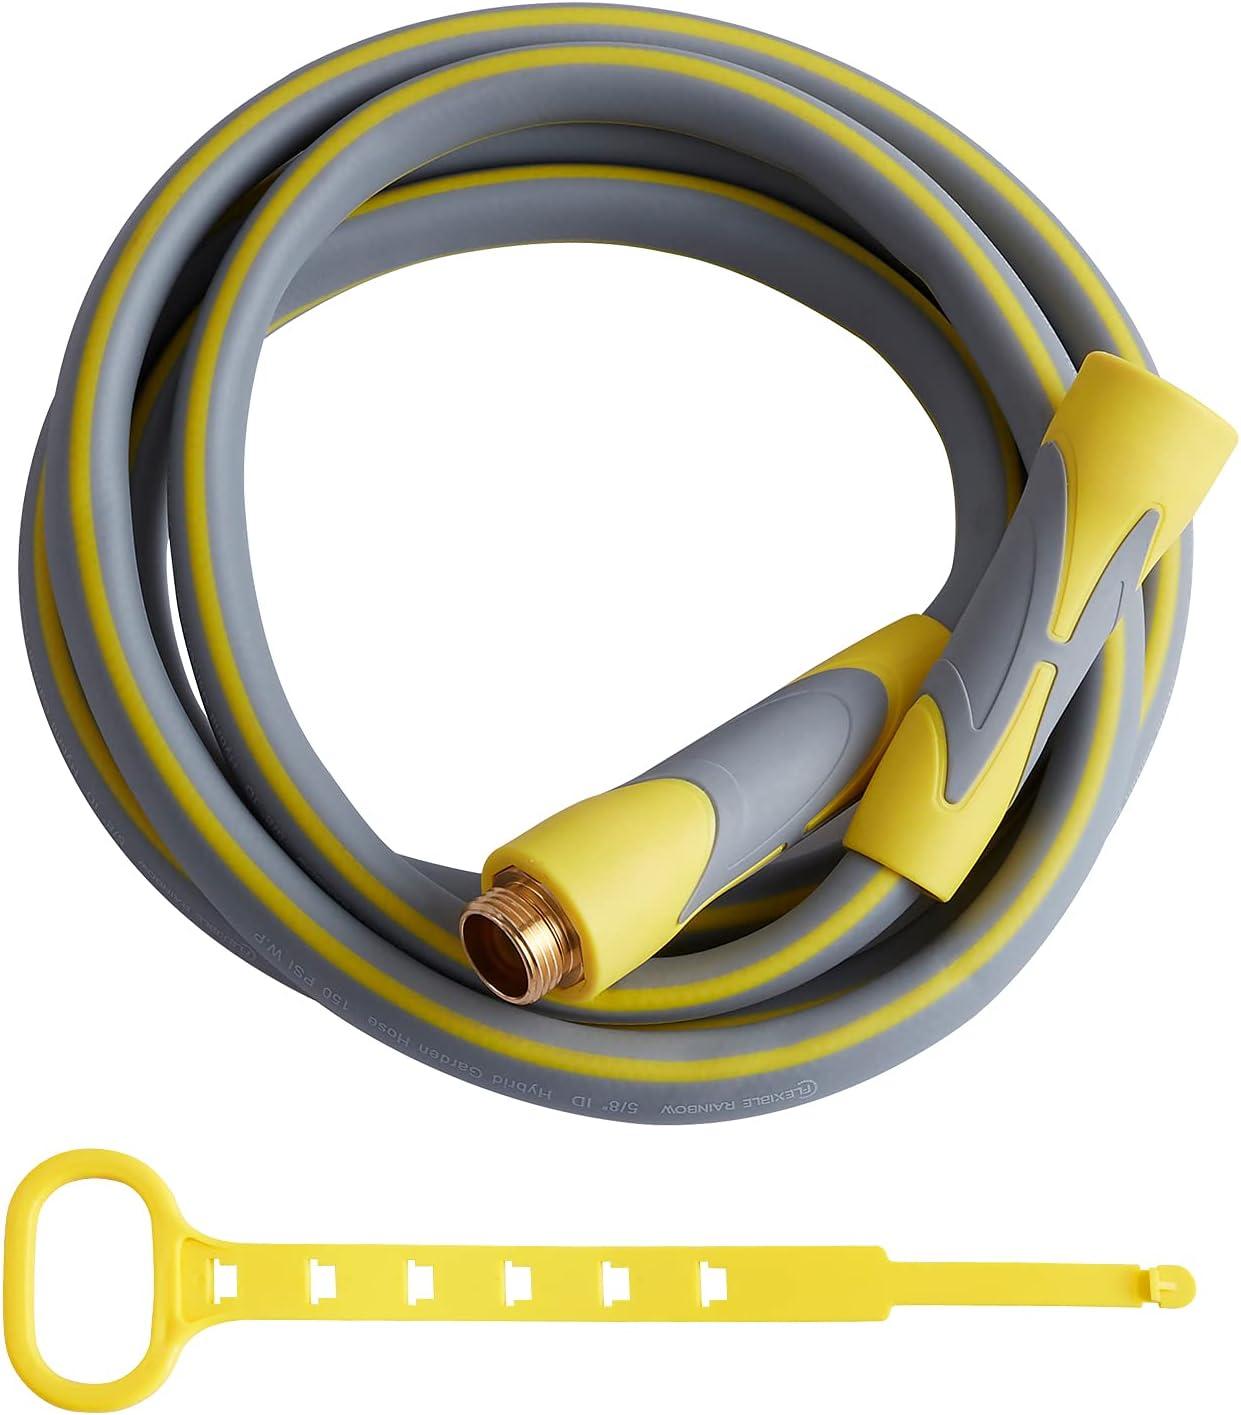 Garden Hose, Hybrid 5/8 in, Heavy Duty, Light Weight and Flexible Water Hose (Yellow, 10' (feet))